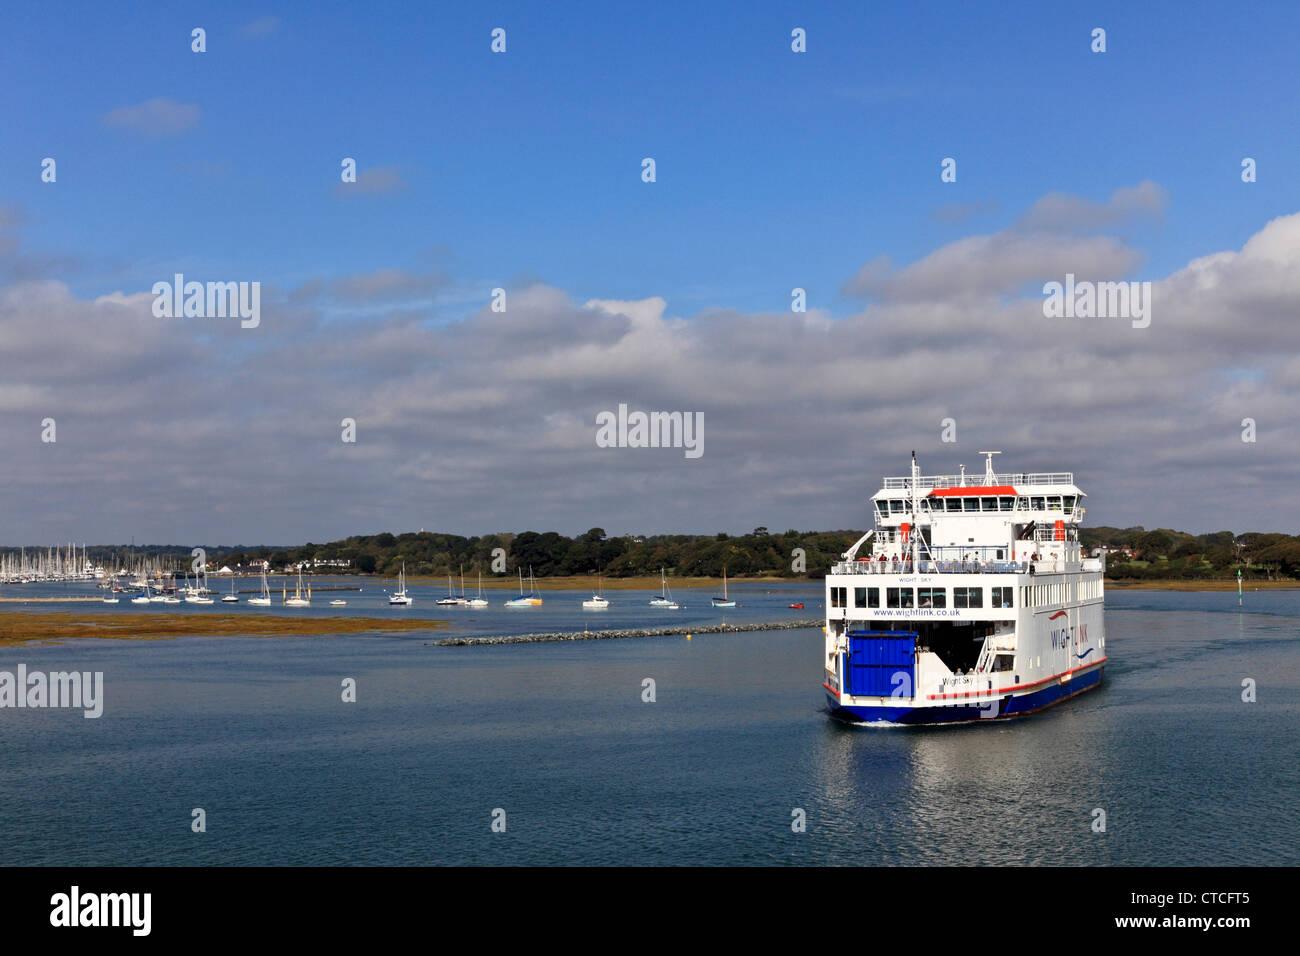 4129. Wight-Link Ferry leaving Lymington, Hampshire, UK - Stock Image